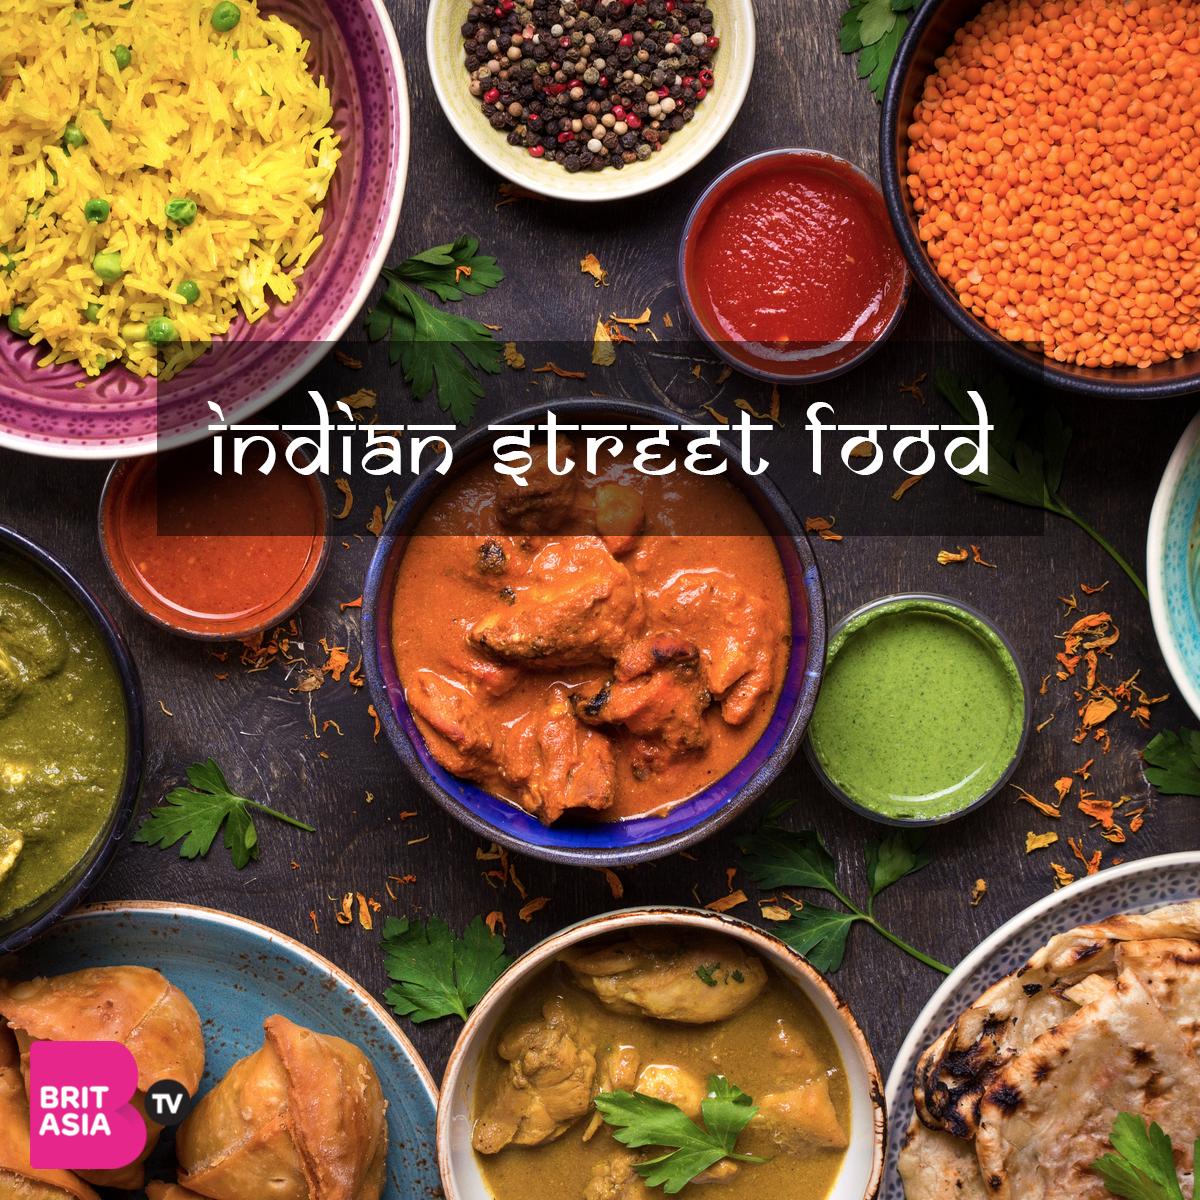 Indian Street Food Britasia Tv